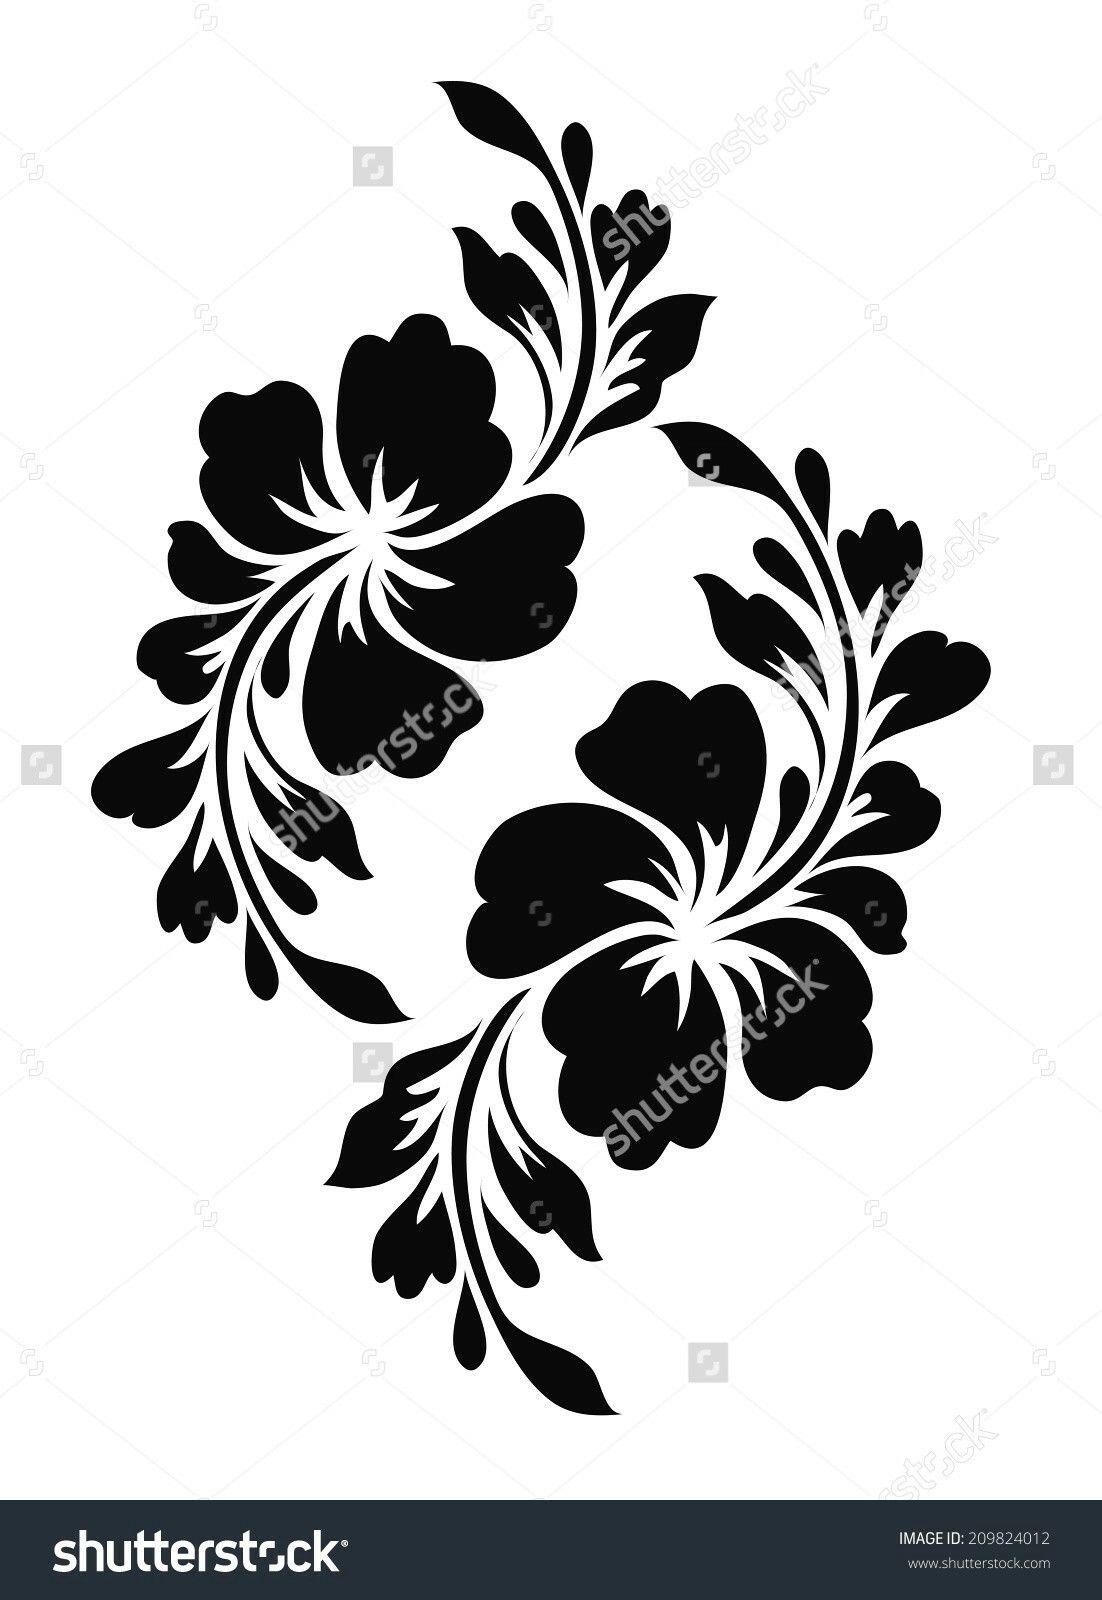 stupf template flower template stencil stencil hibiscus flowers Wall stencil Decor template painter template